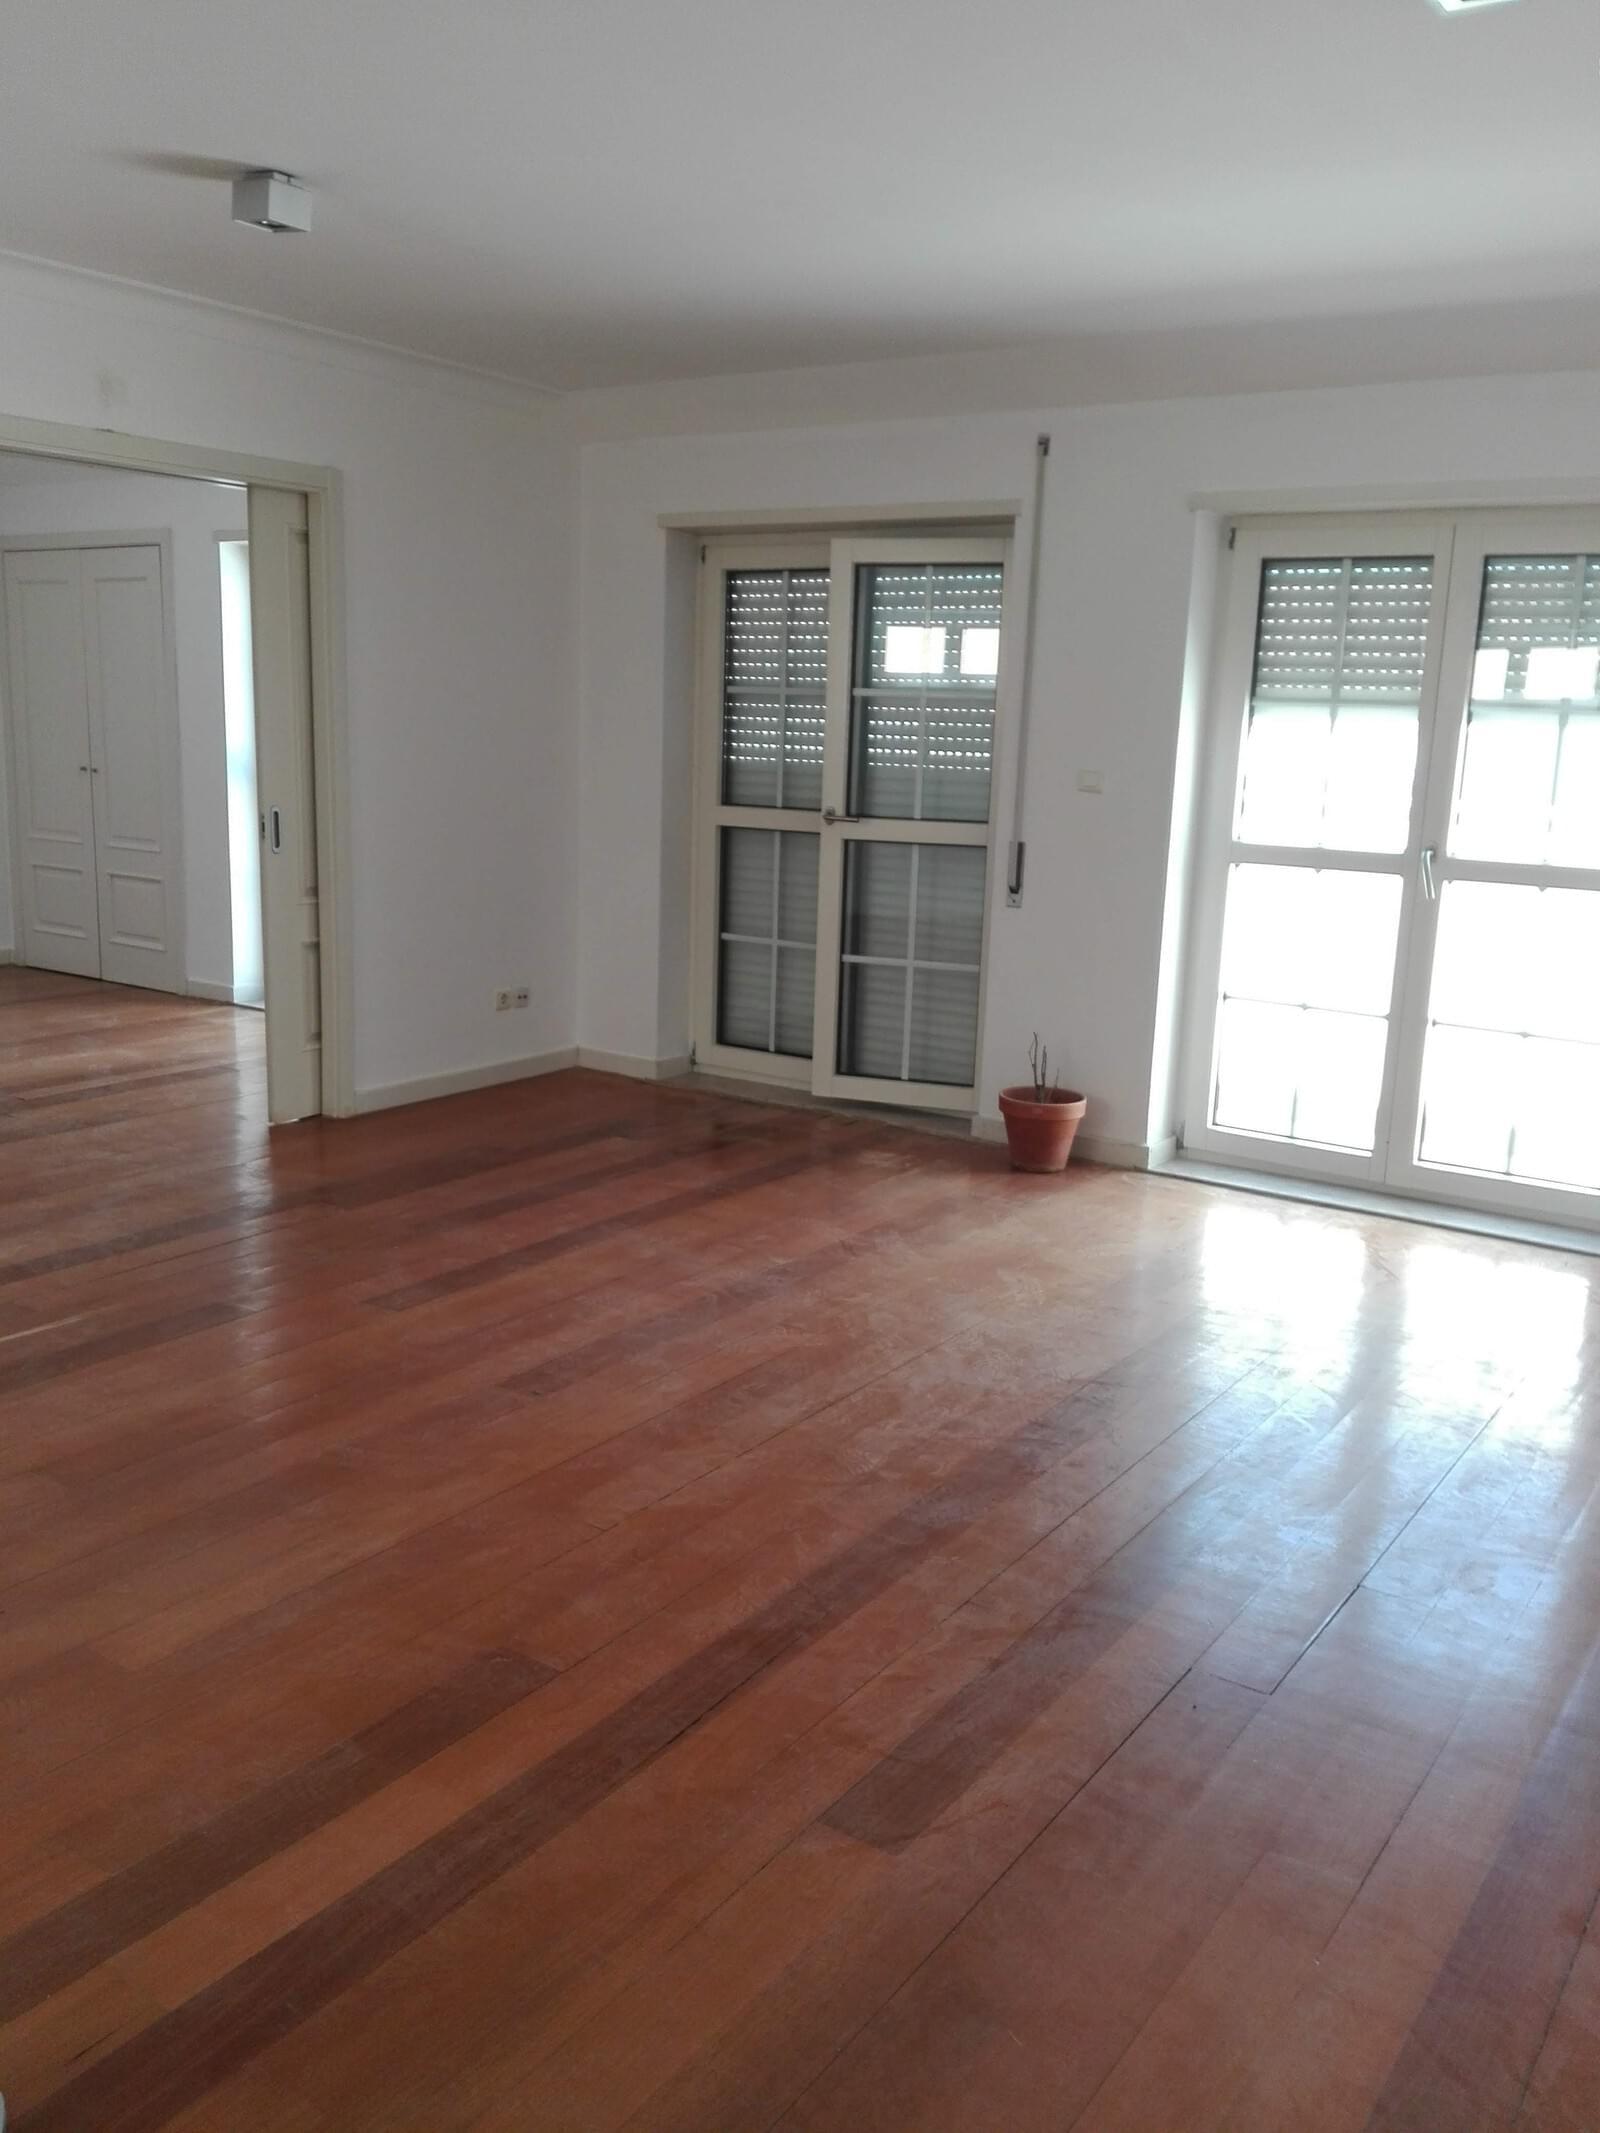 pf17908-apartamento-t1-lisboa-c0f1872e-08d1-44fa-896f-7993d3a08d73